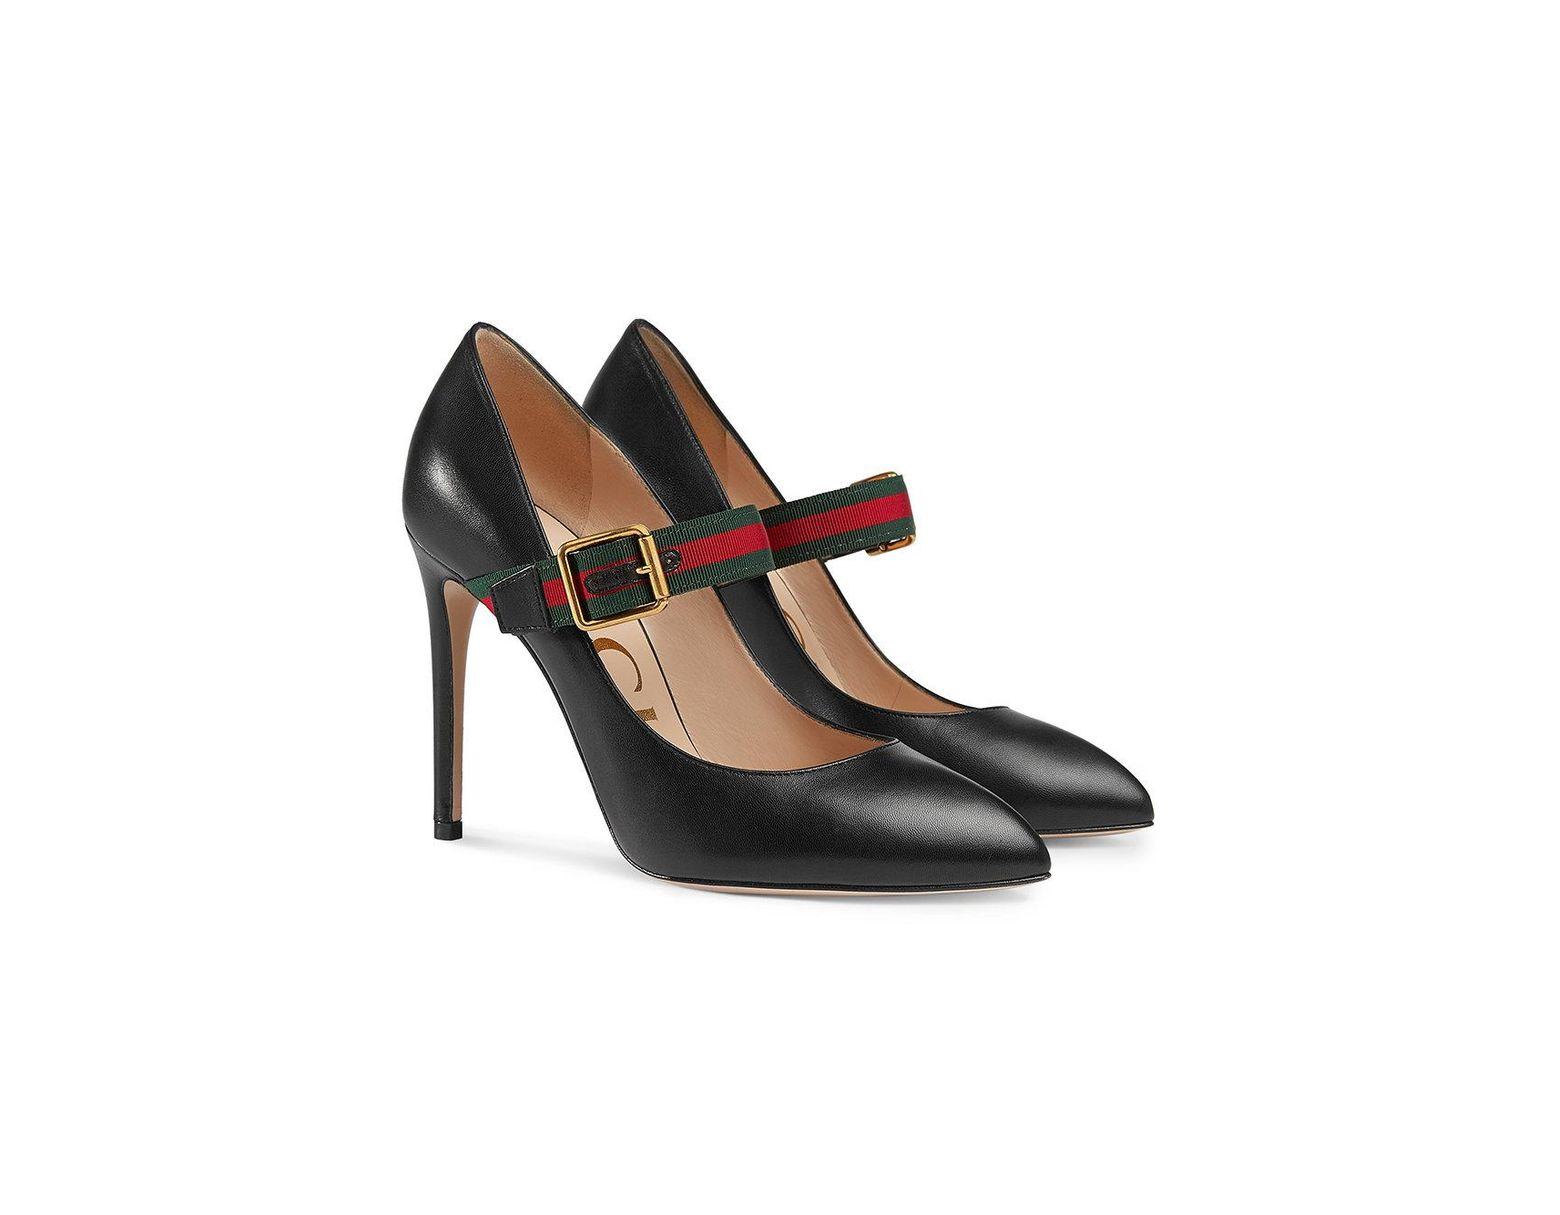 6eceb06f1 Gucci Sylvie Leather Mid-heel Pumps in Black - Lyst